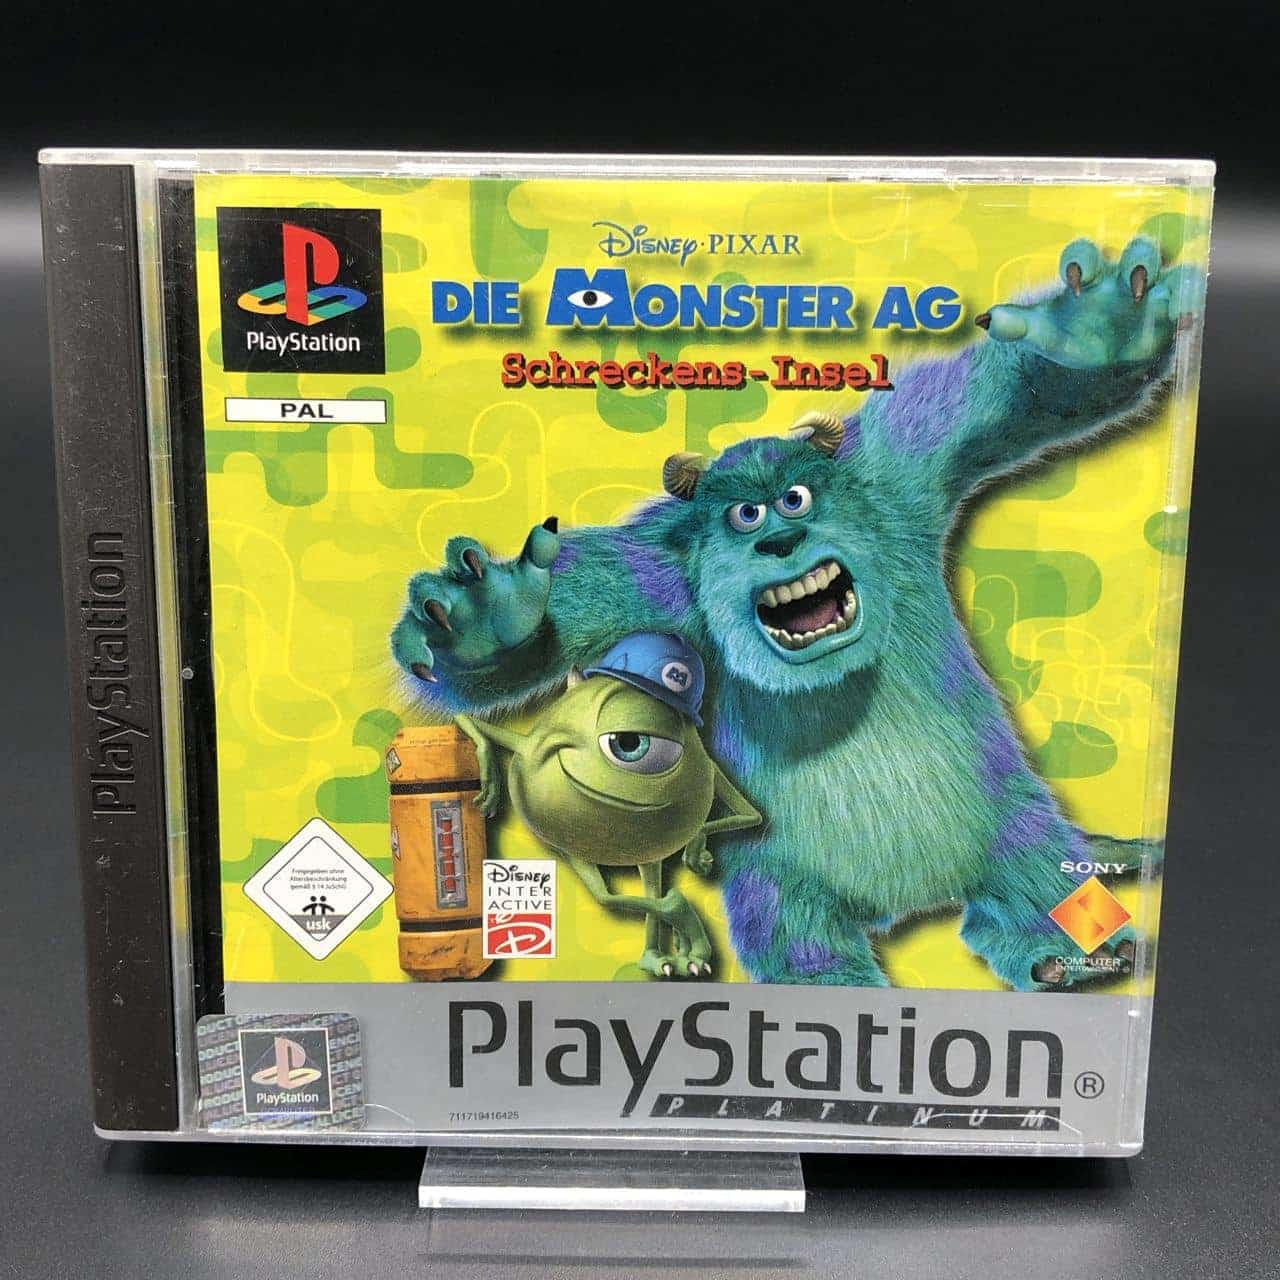 PS1 Die Monster AG: Schreckens-Insel (Platinum) (Komplett) (Sehr gut) Sony PlayStation 1